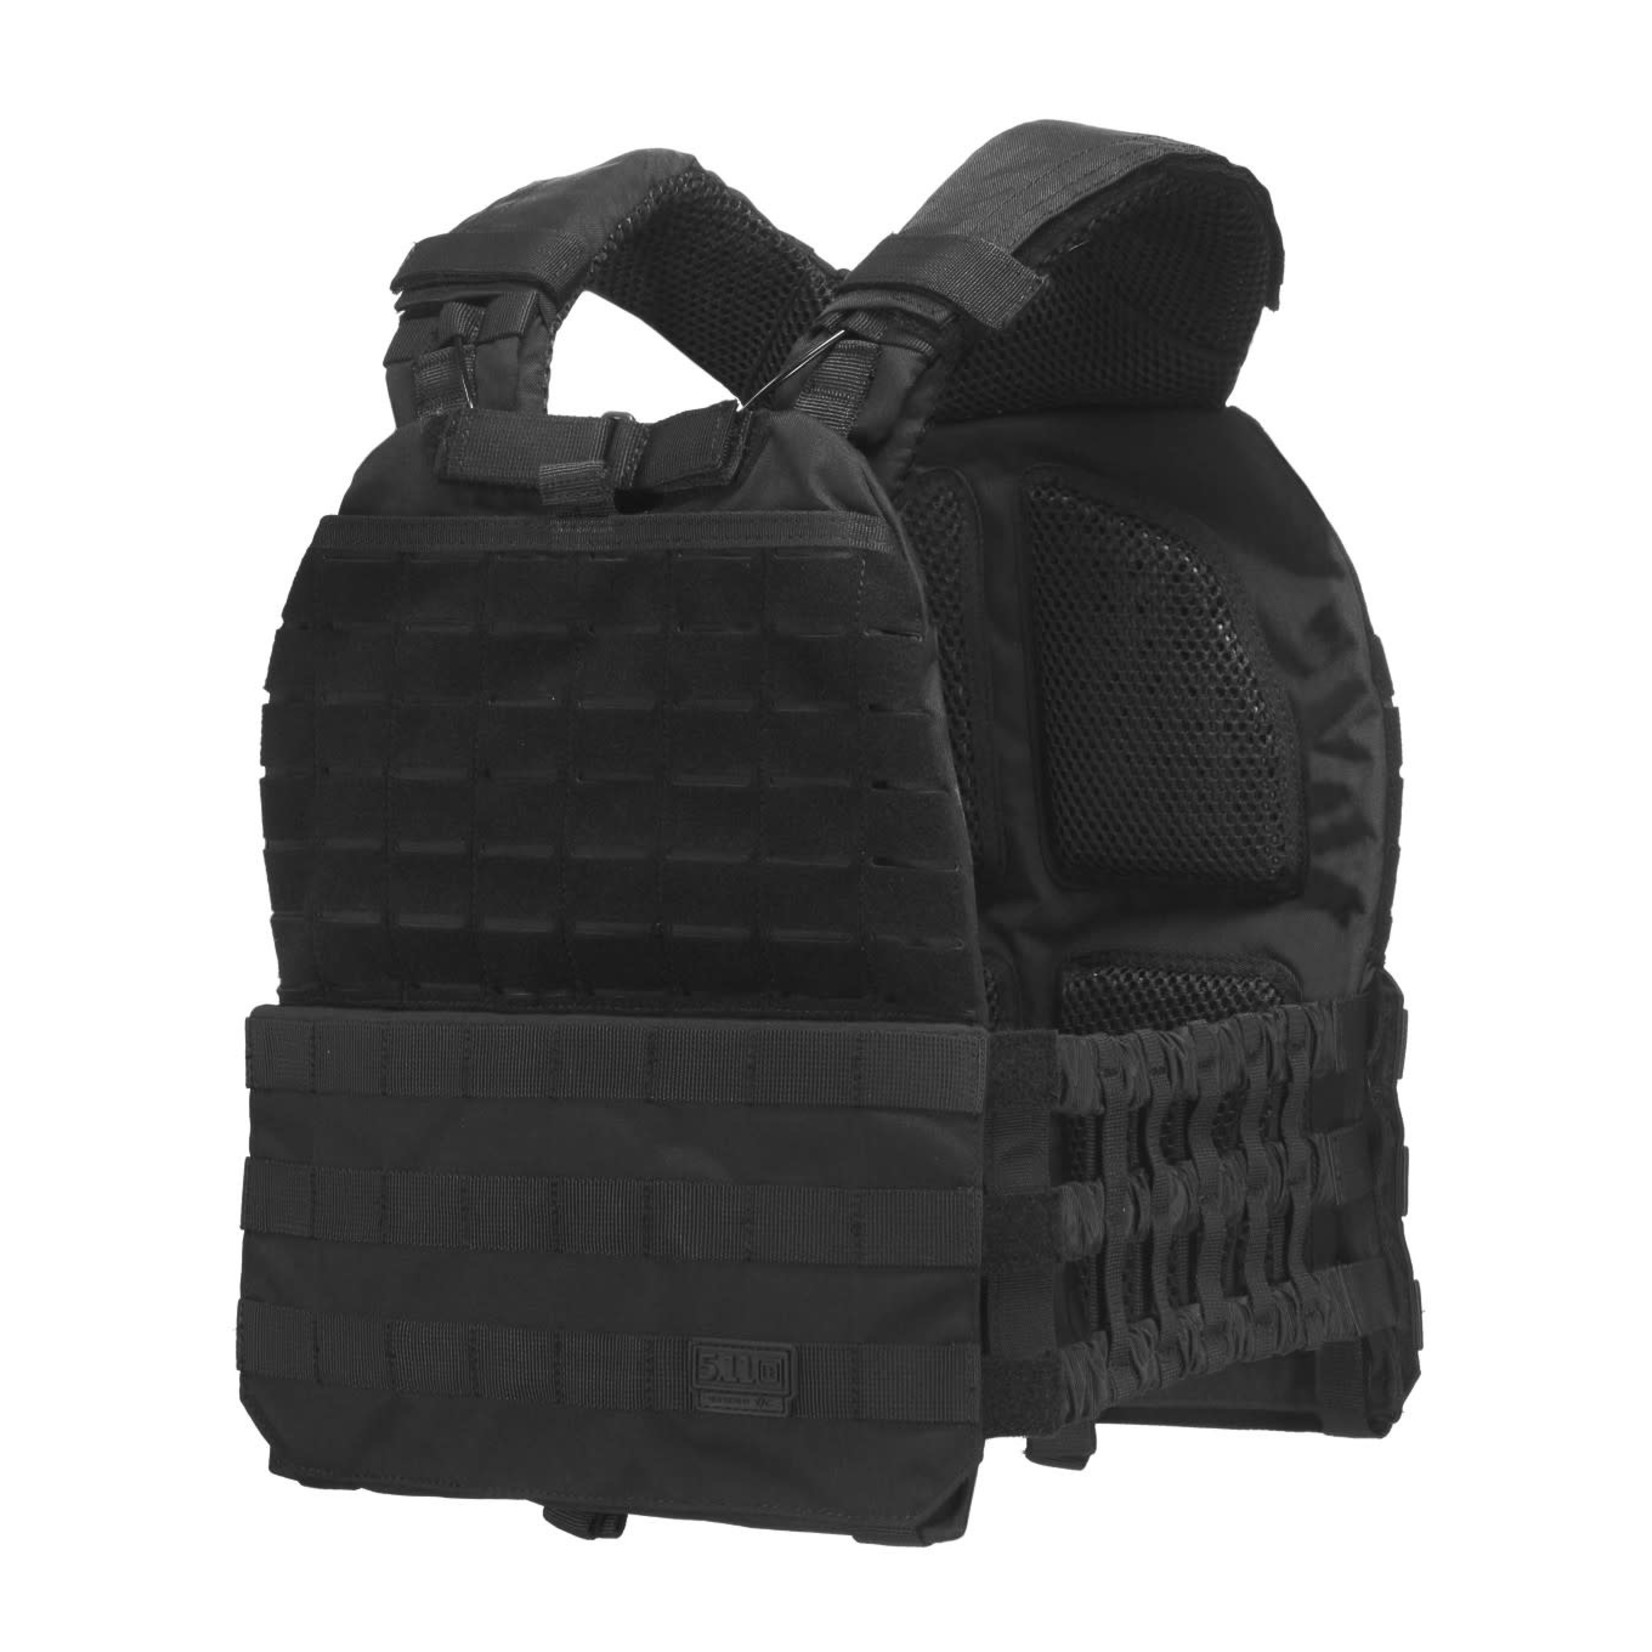 5.11 Tactical 5.11 Tactec Plate Carrier- S-XL